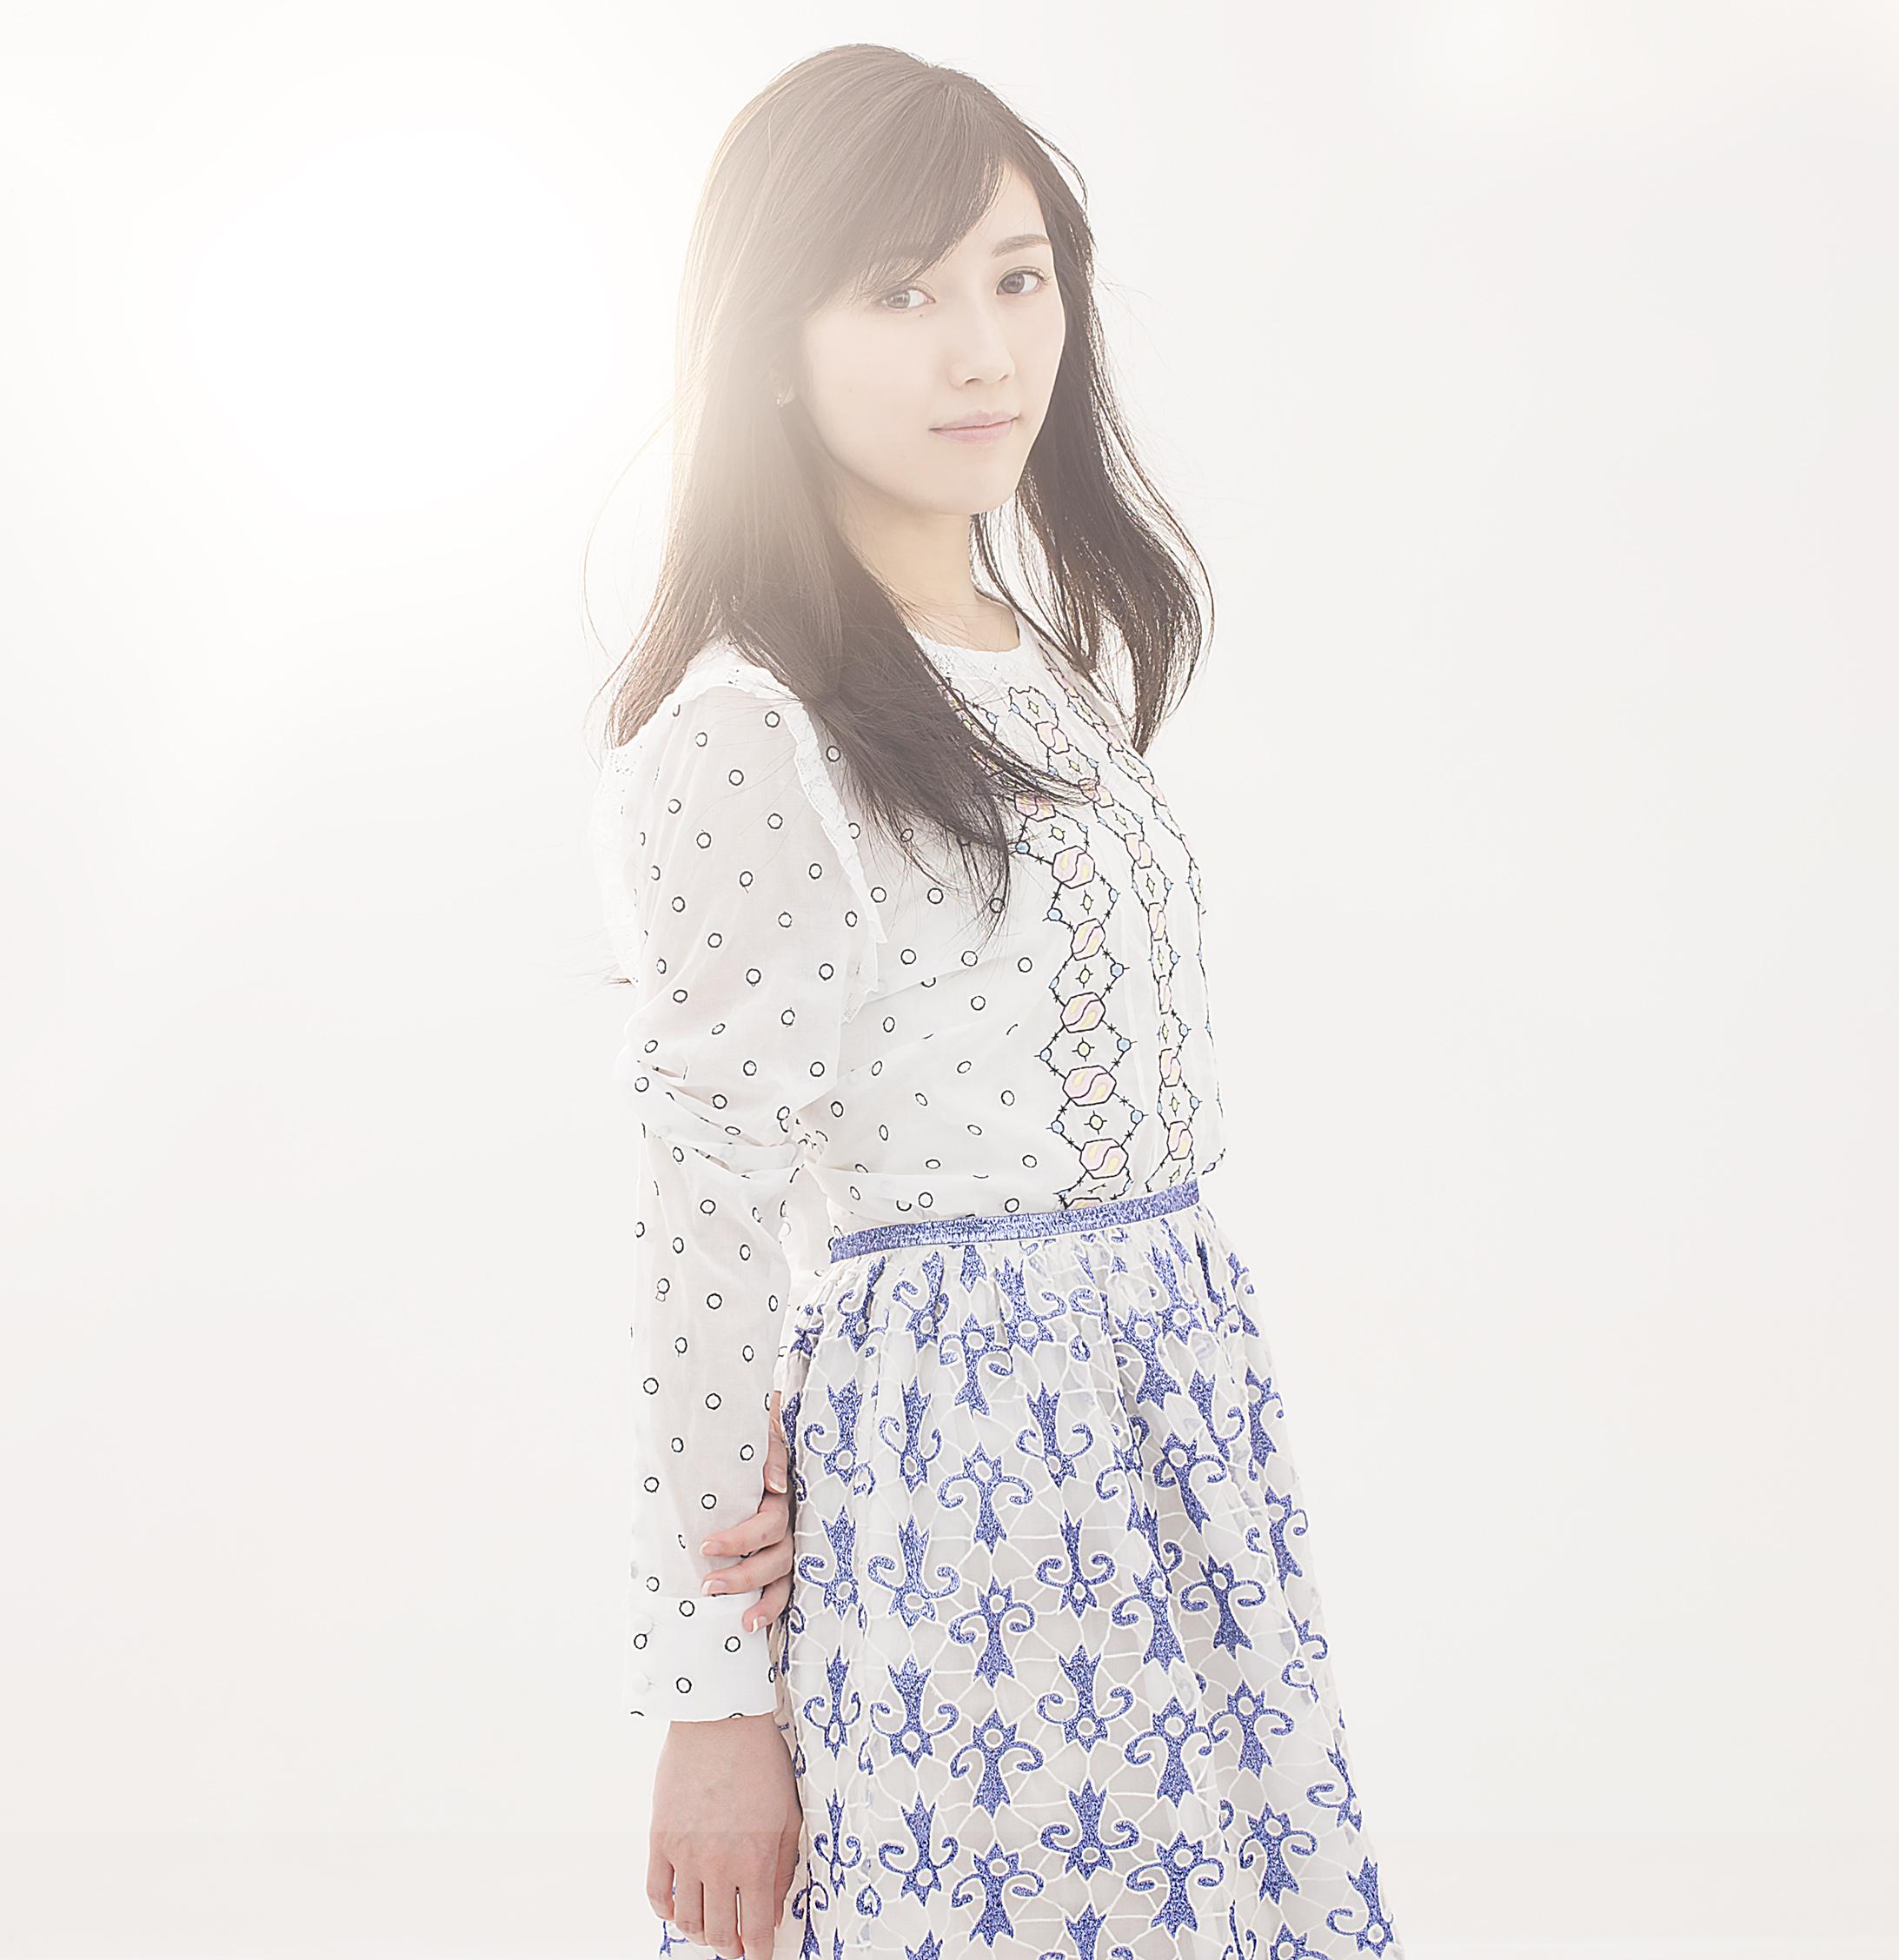 HKT48指原莉乃が、宝塚オタク・AKB48渡辺麻友のリアルな生態をものまねで暴露サムネイル画像